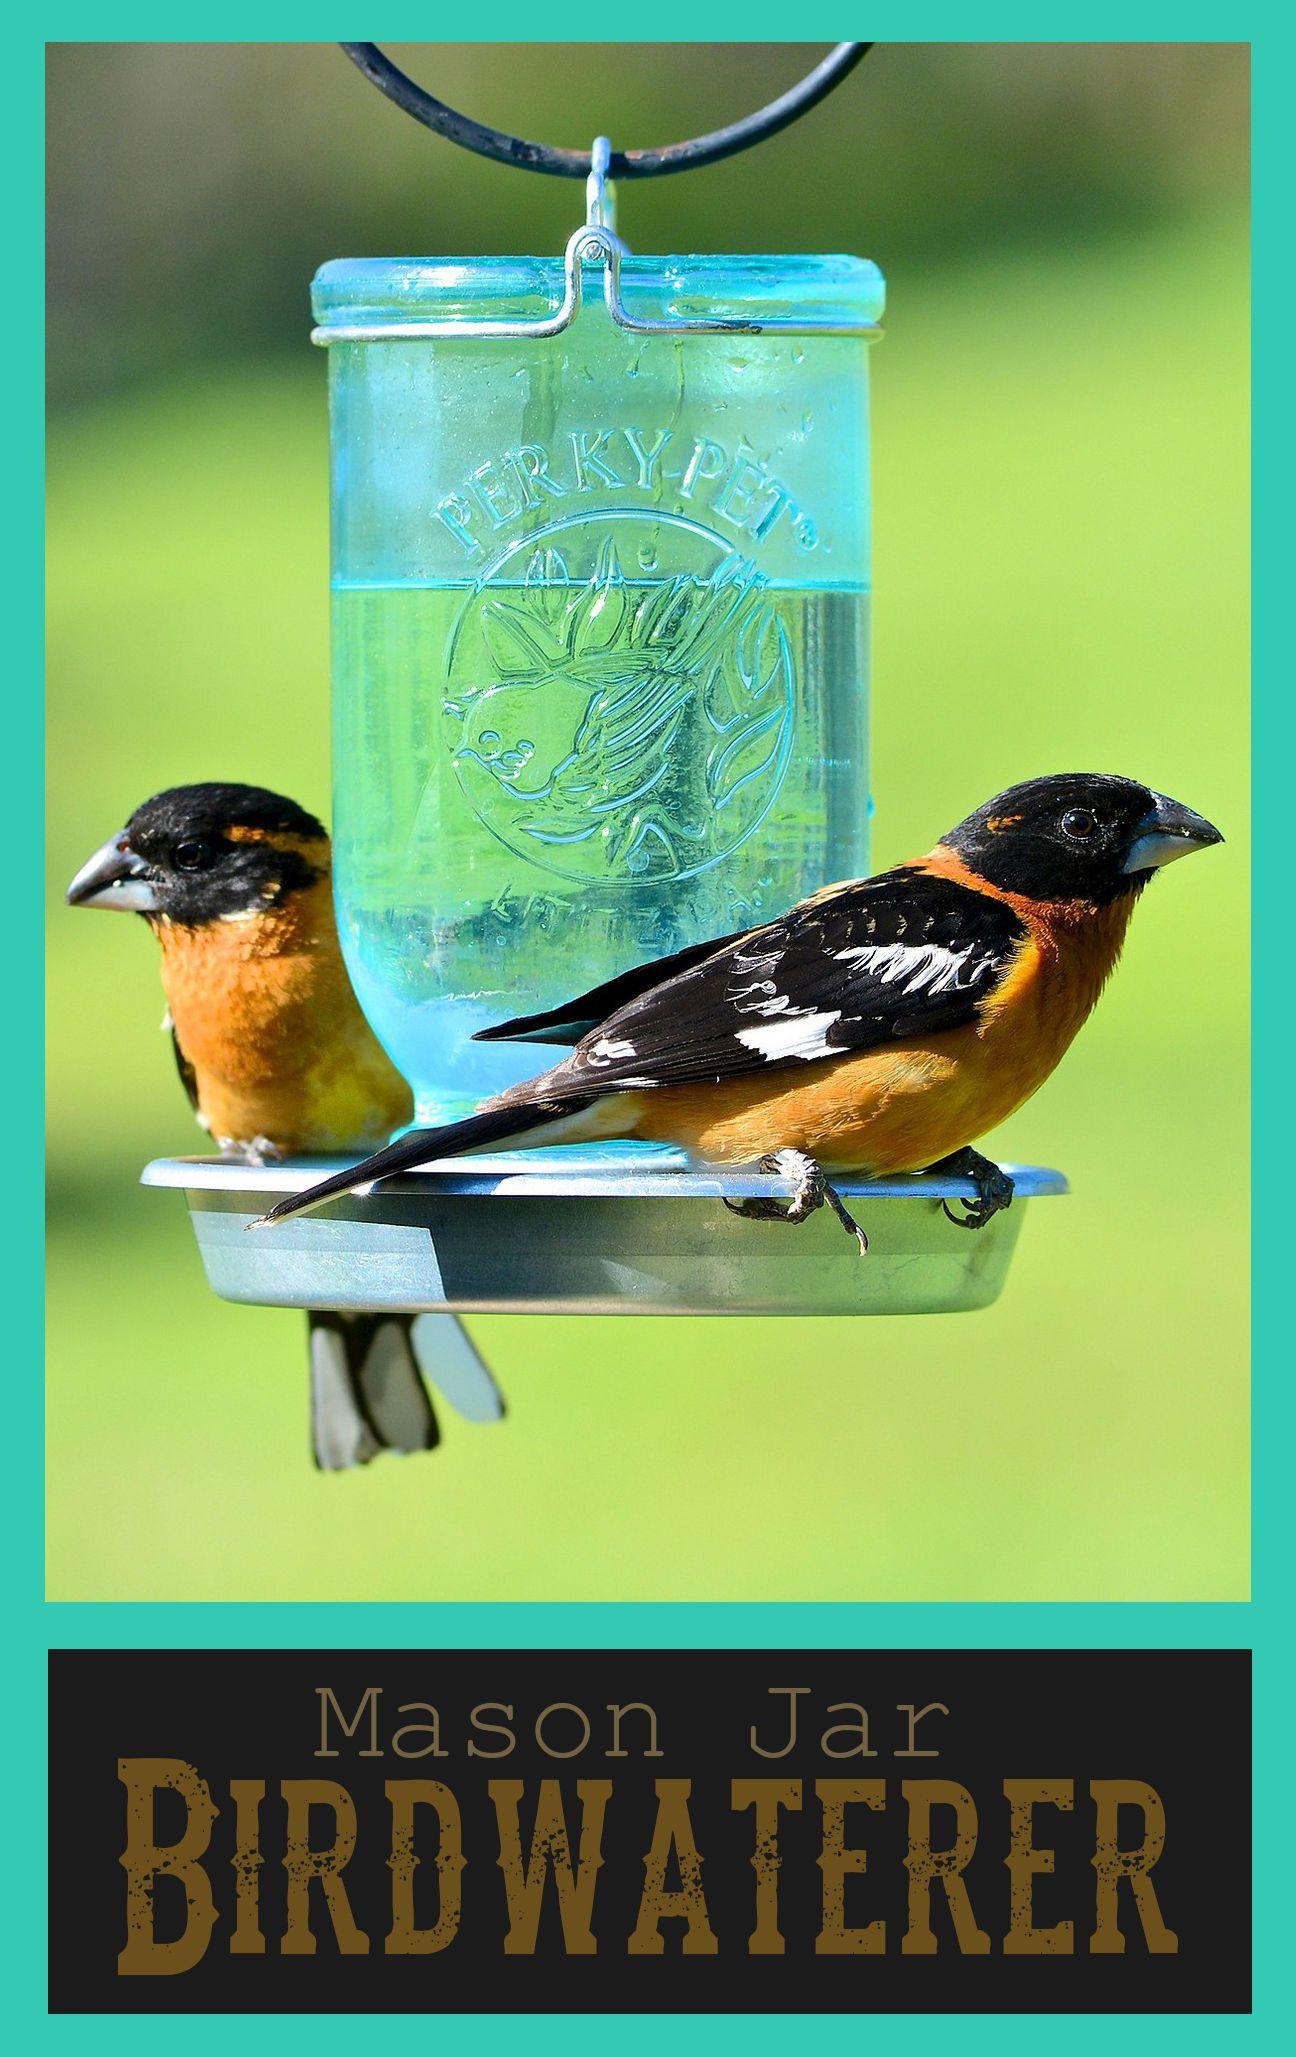 Mason Jar Bird Waterer Affiliate Mason Jars Bird House Feeder Diy Garden Projects